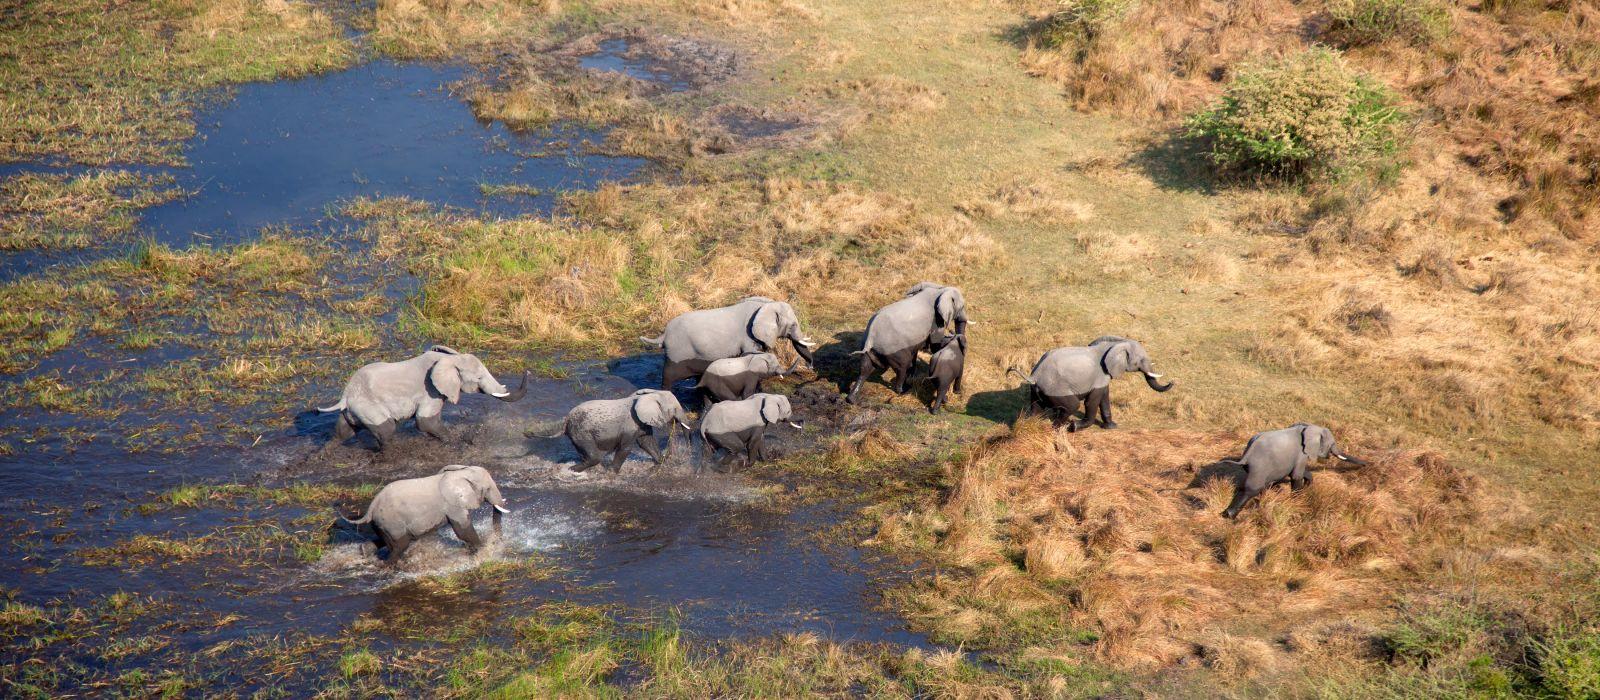 Aerial view of African Elephants Loxodonta africana, Okavango Delta, Botswana, Africa